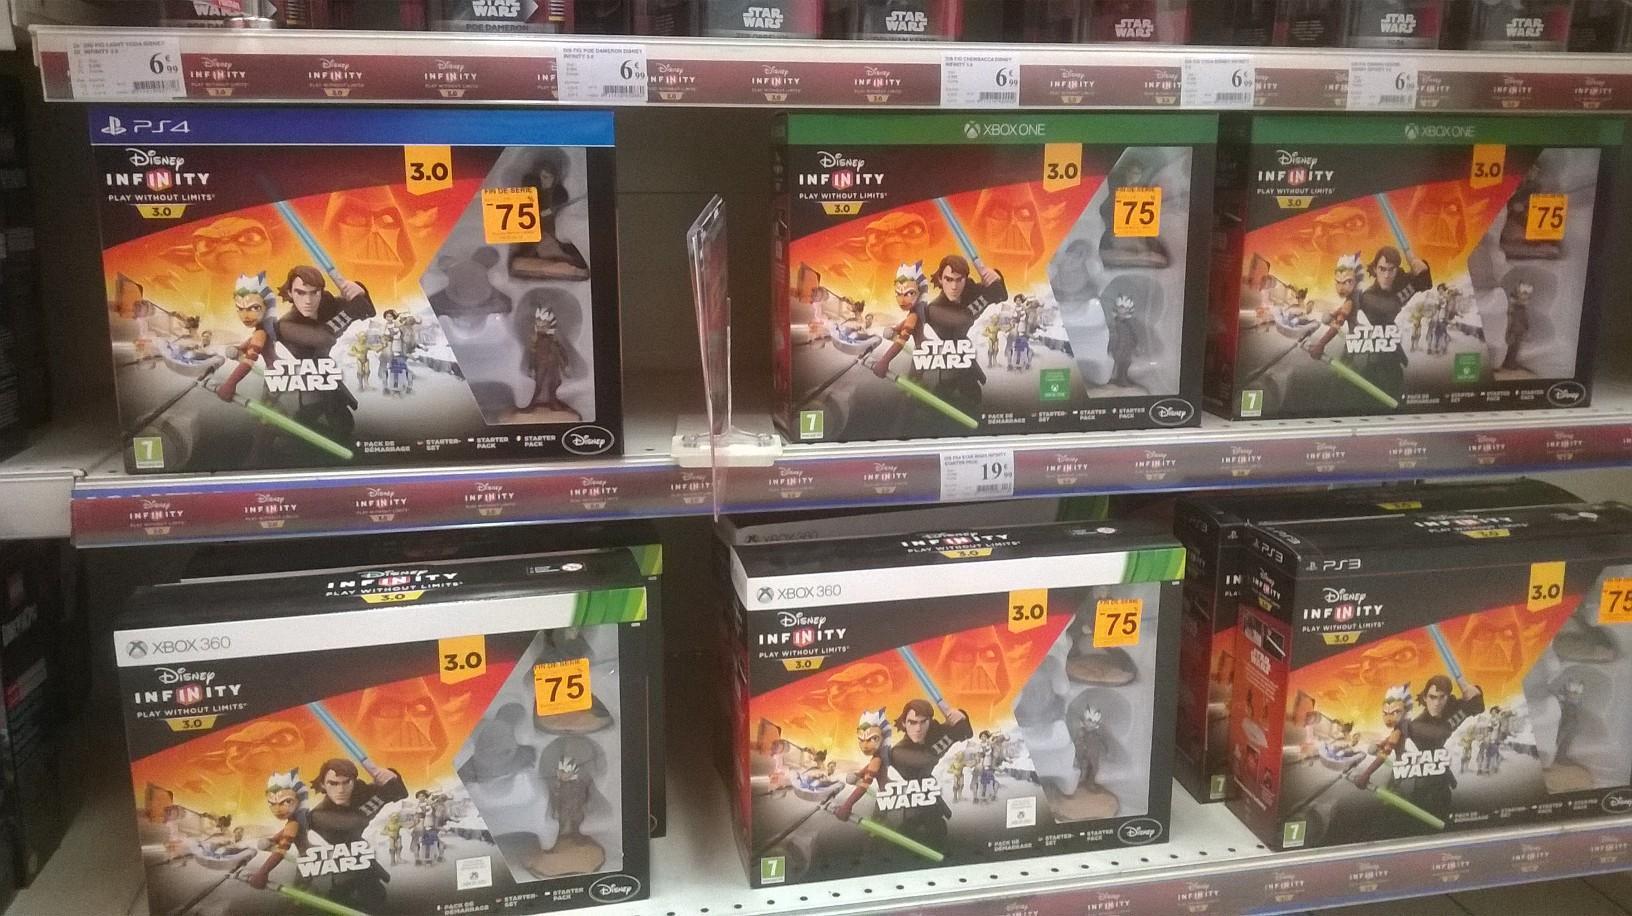 Pack de démarrage Disney Infinity 3.0 - Star Wars sur PS4 / Xbox One / PS3 / Xbox 360